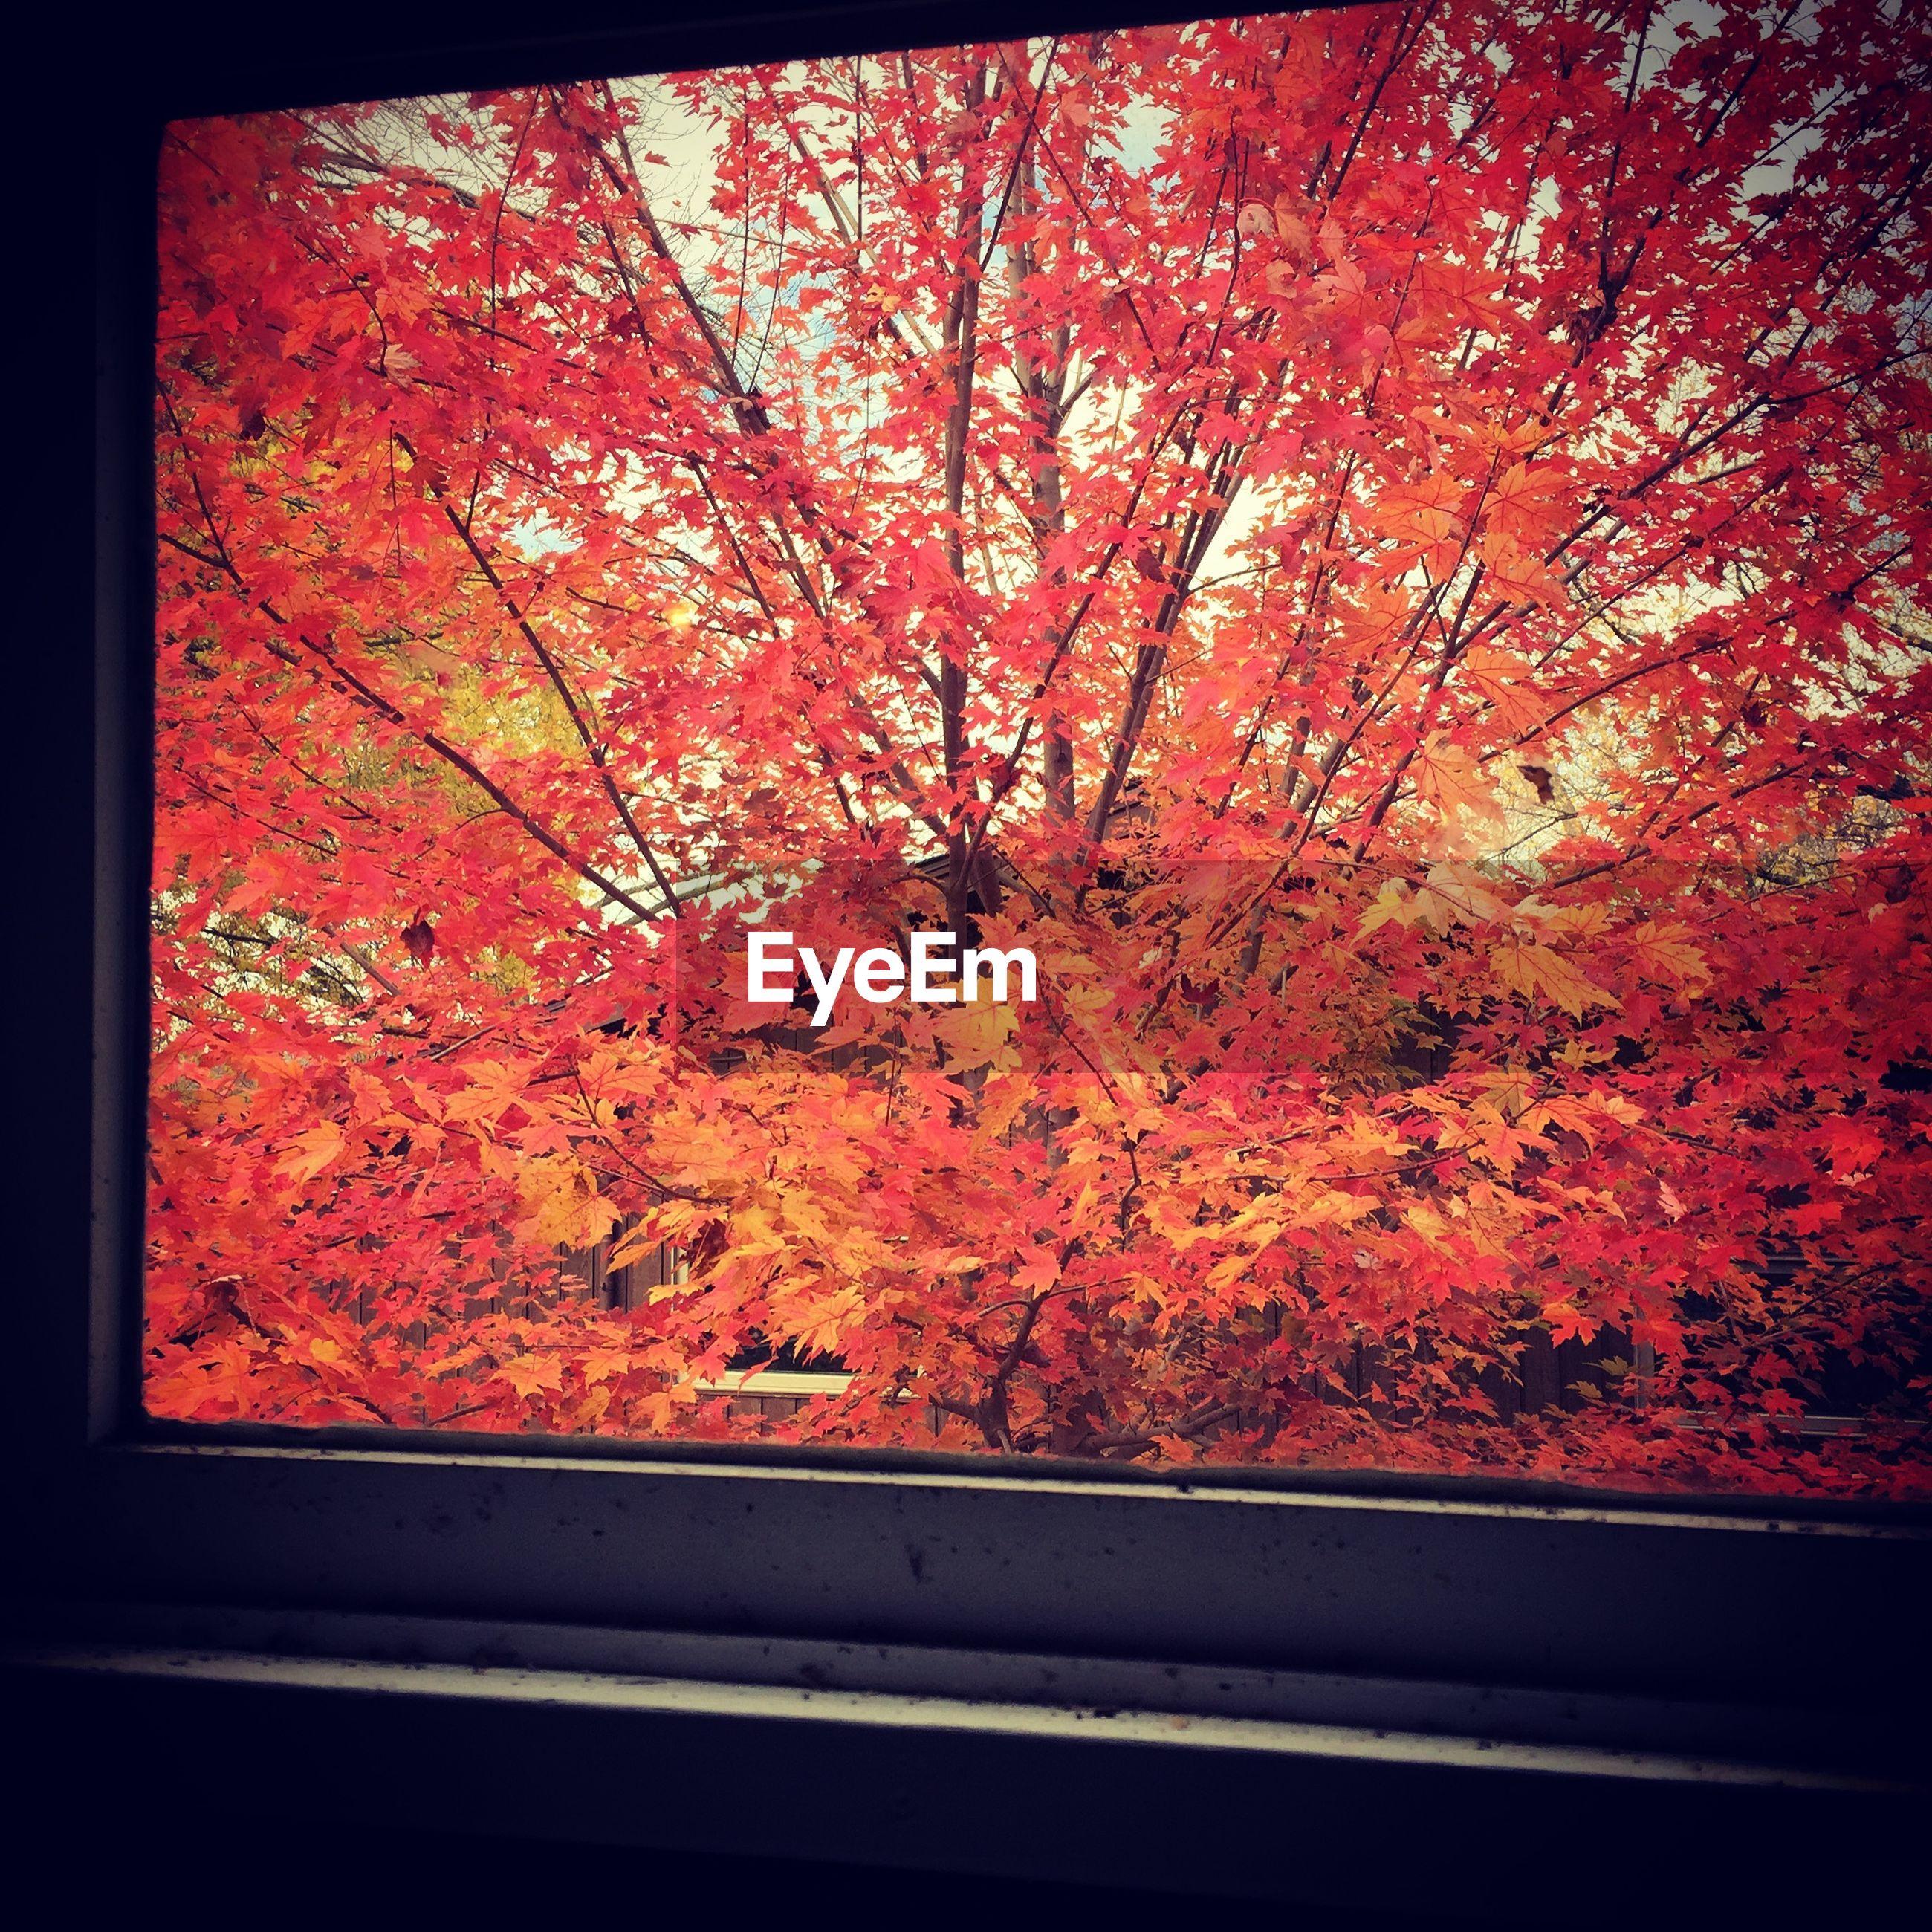 Trees seen through window during autumn